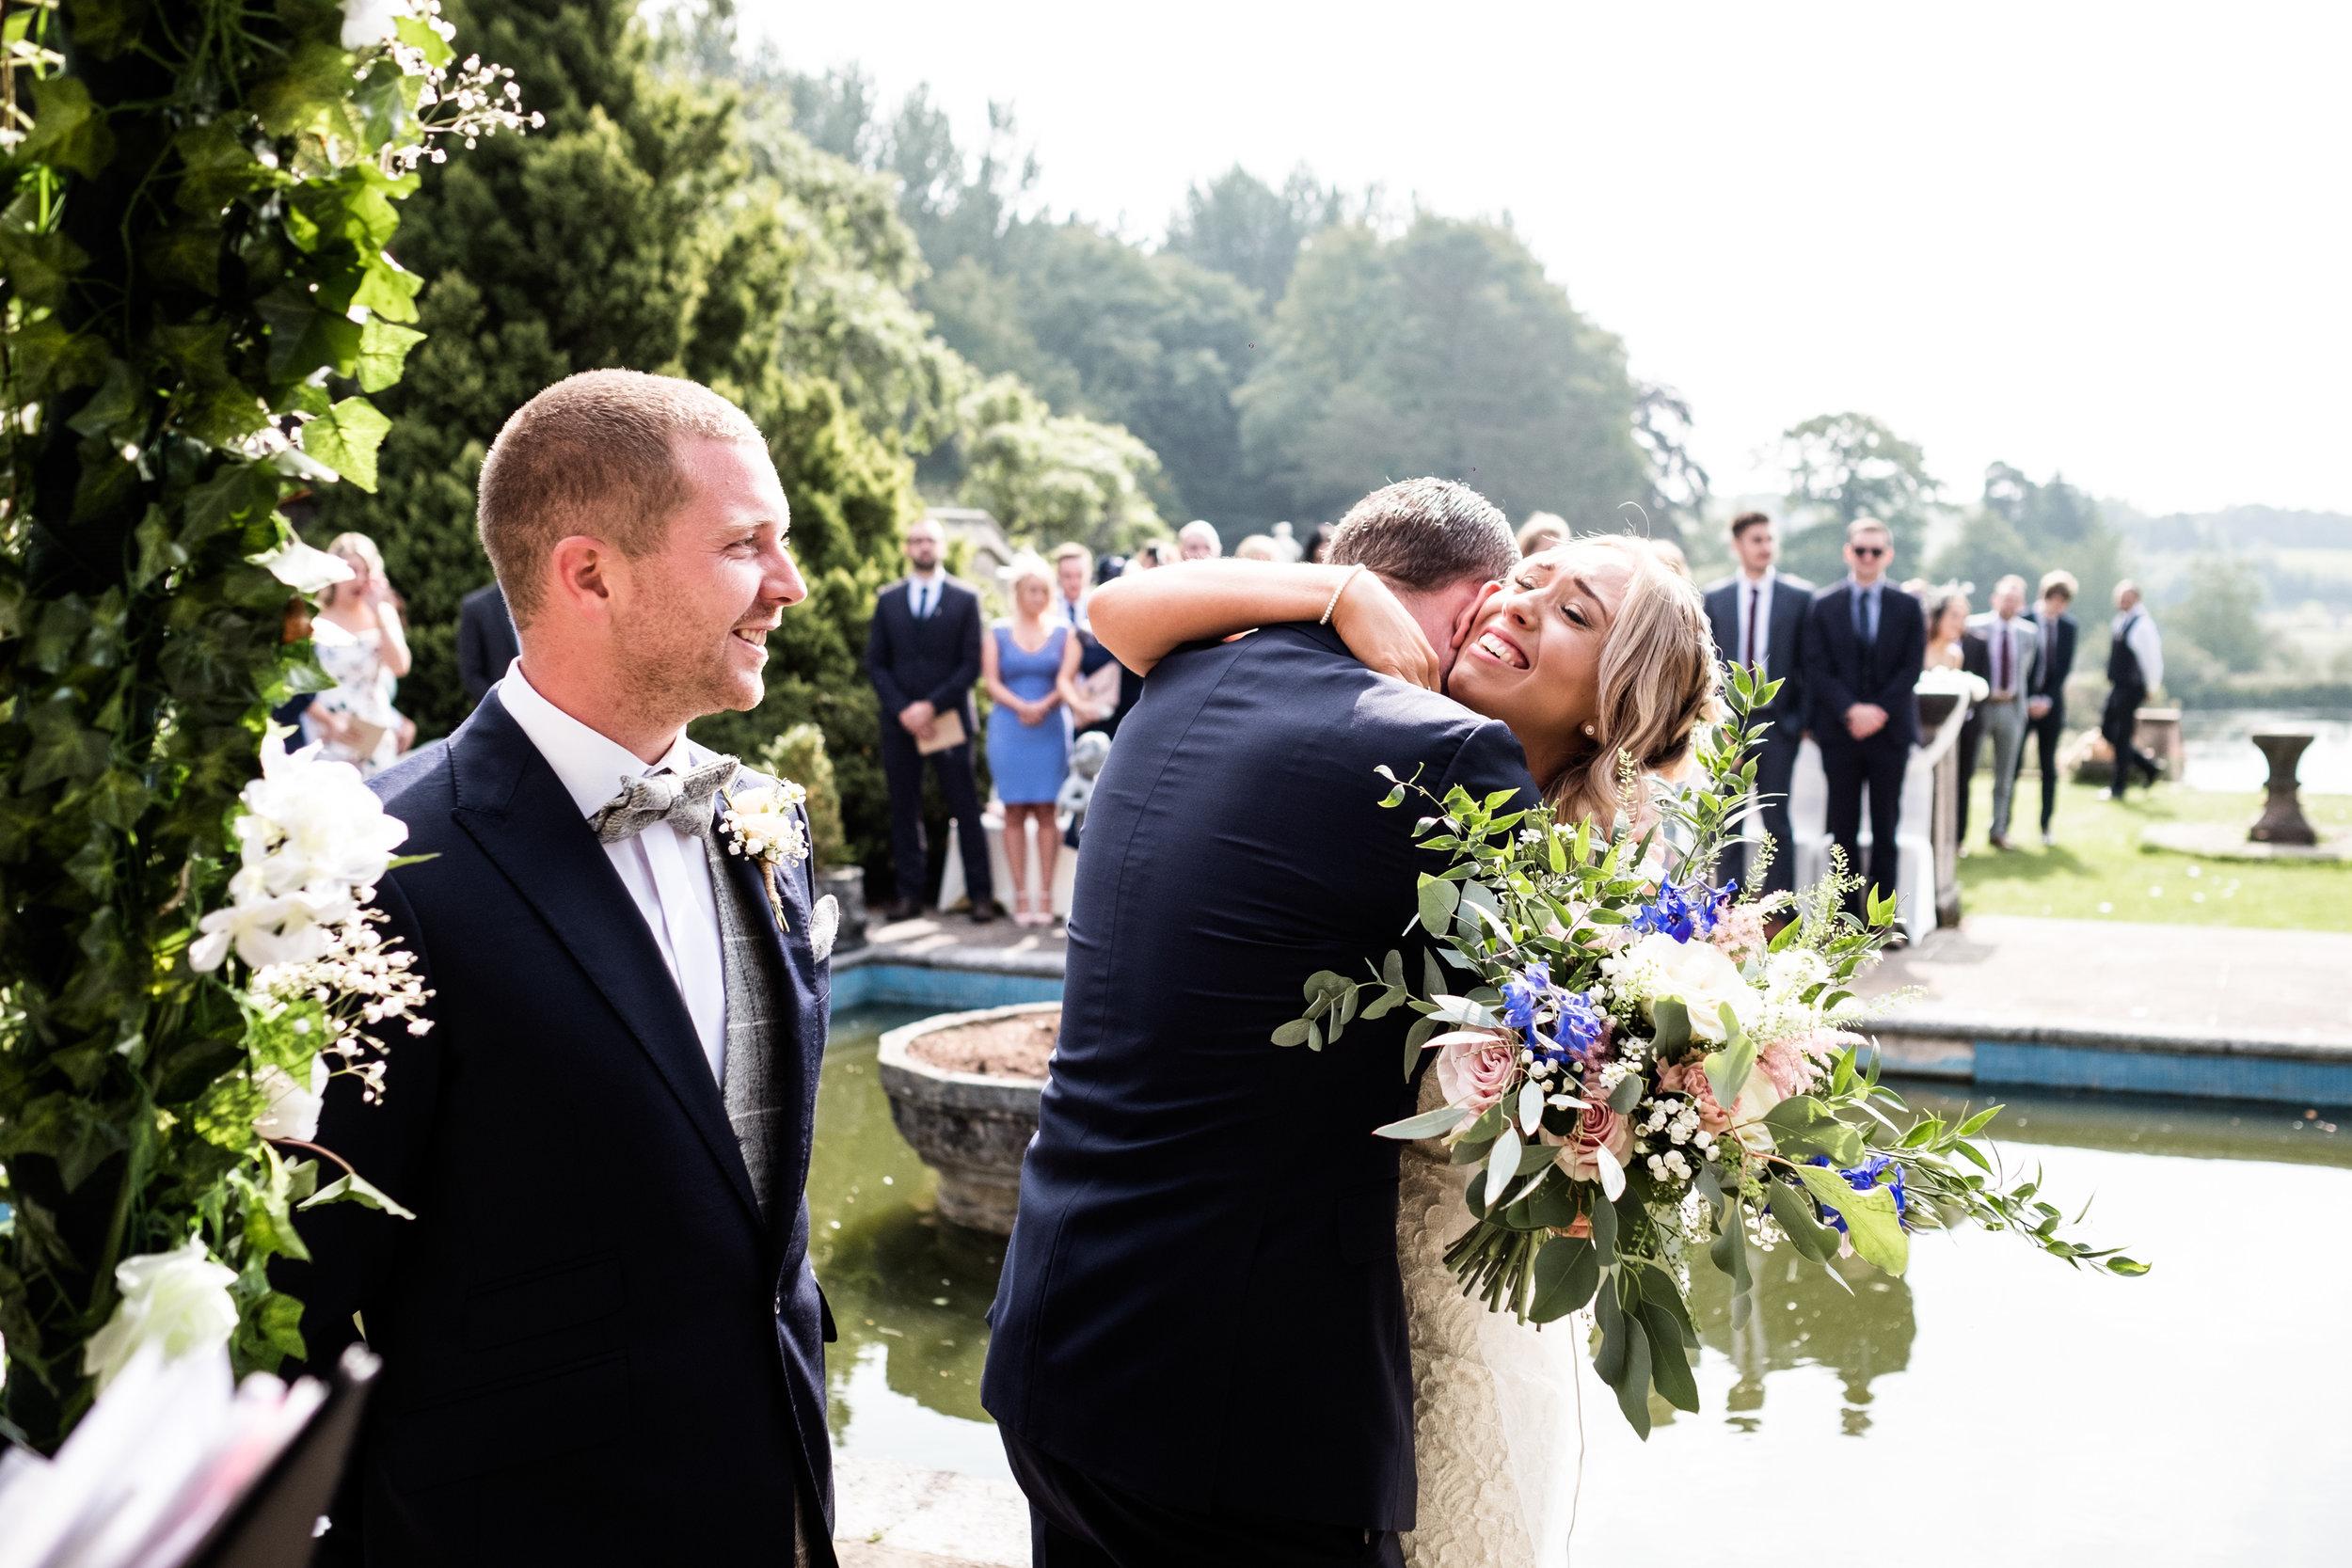 Summer Documentary Wedding Photography at Consall Hall Gardens Outdoor Ceremony Cockapoo dog - Jenny Harper-20.jpg